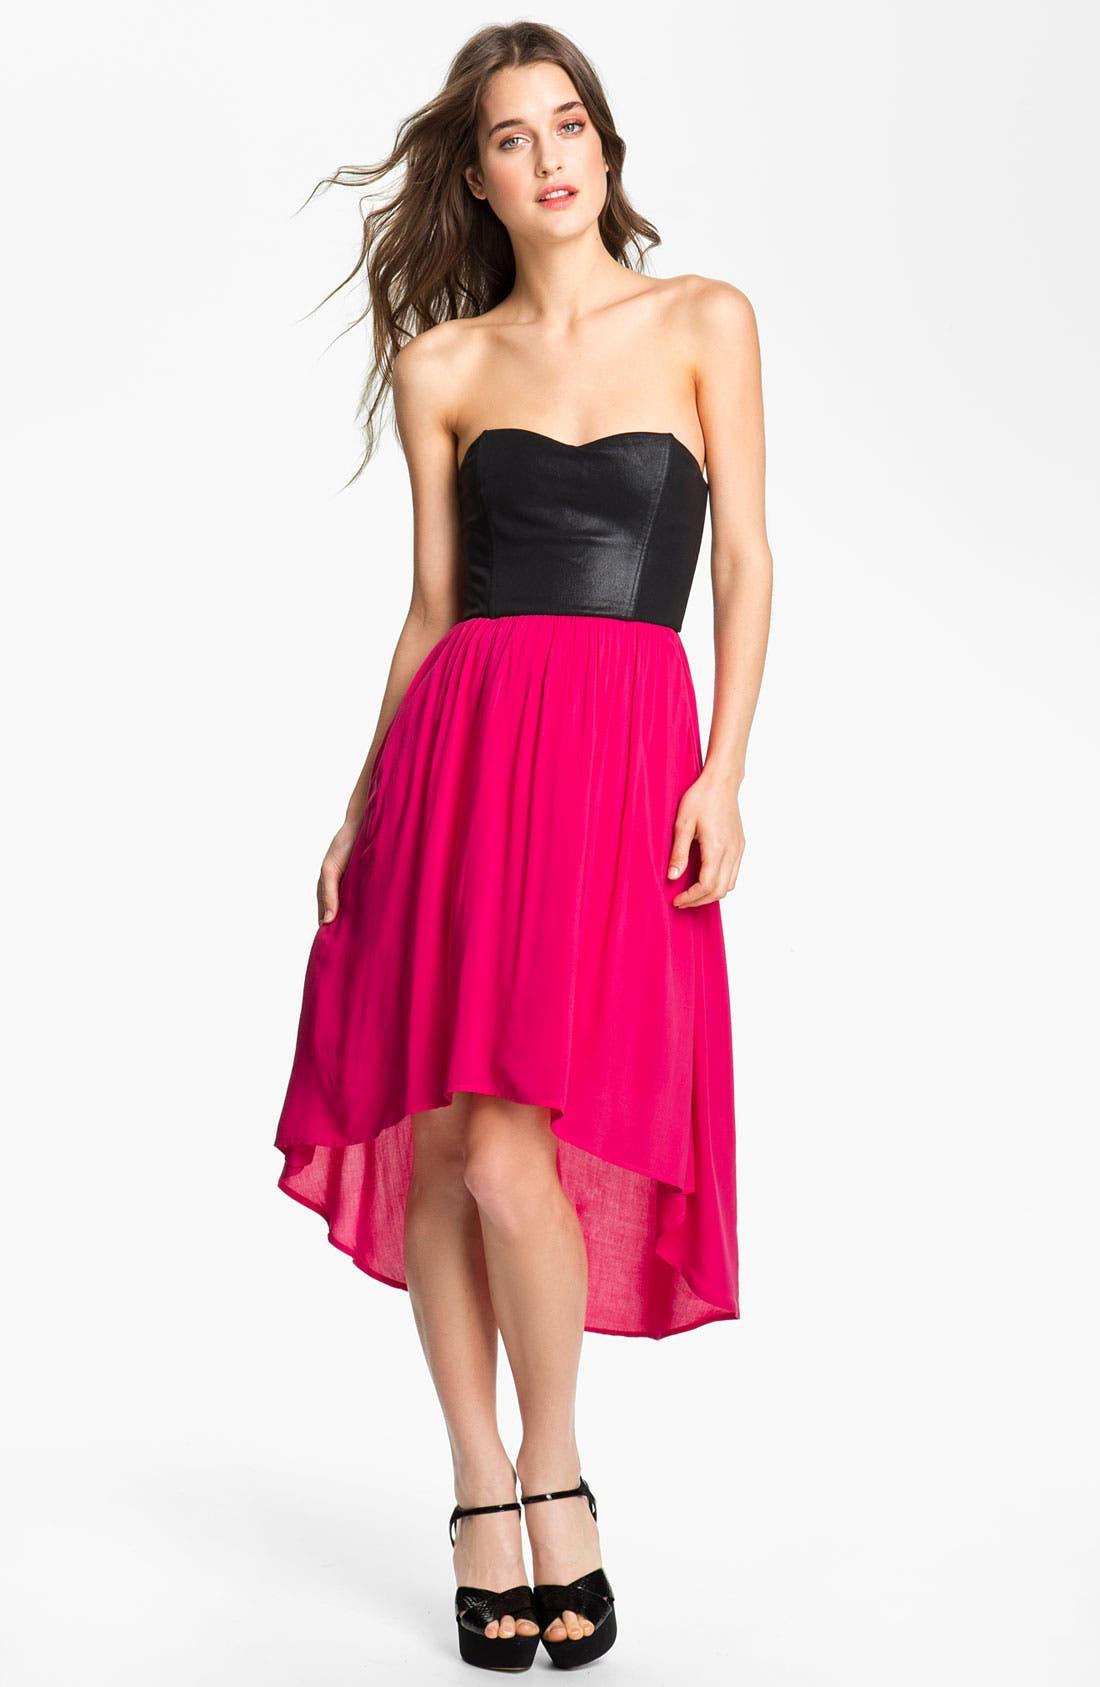 Main Image - Ella Moss 'Roslyn' Colorblock Strapless Dress